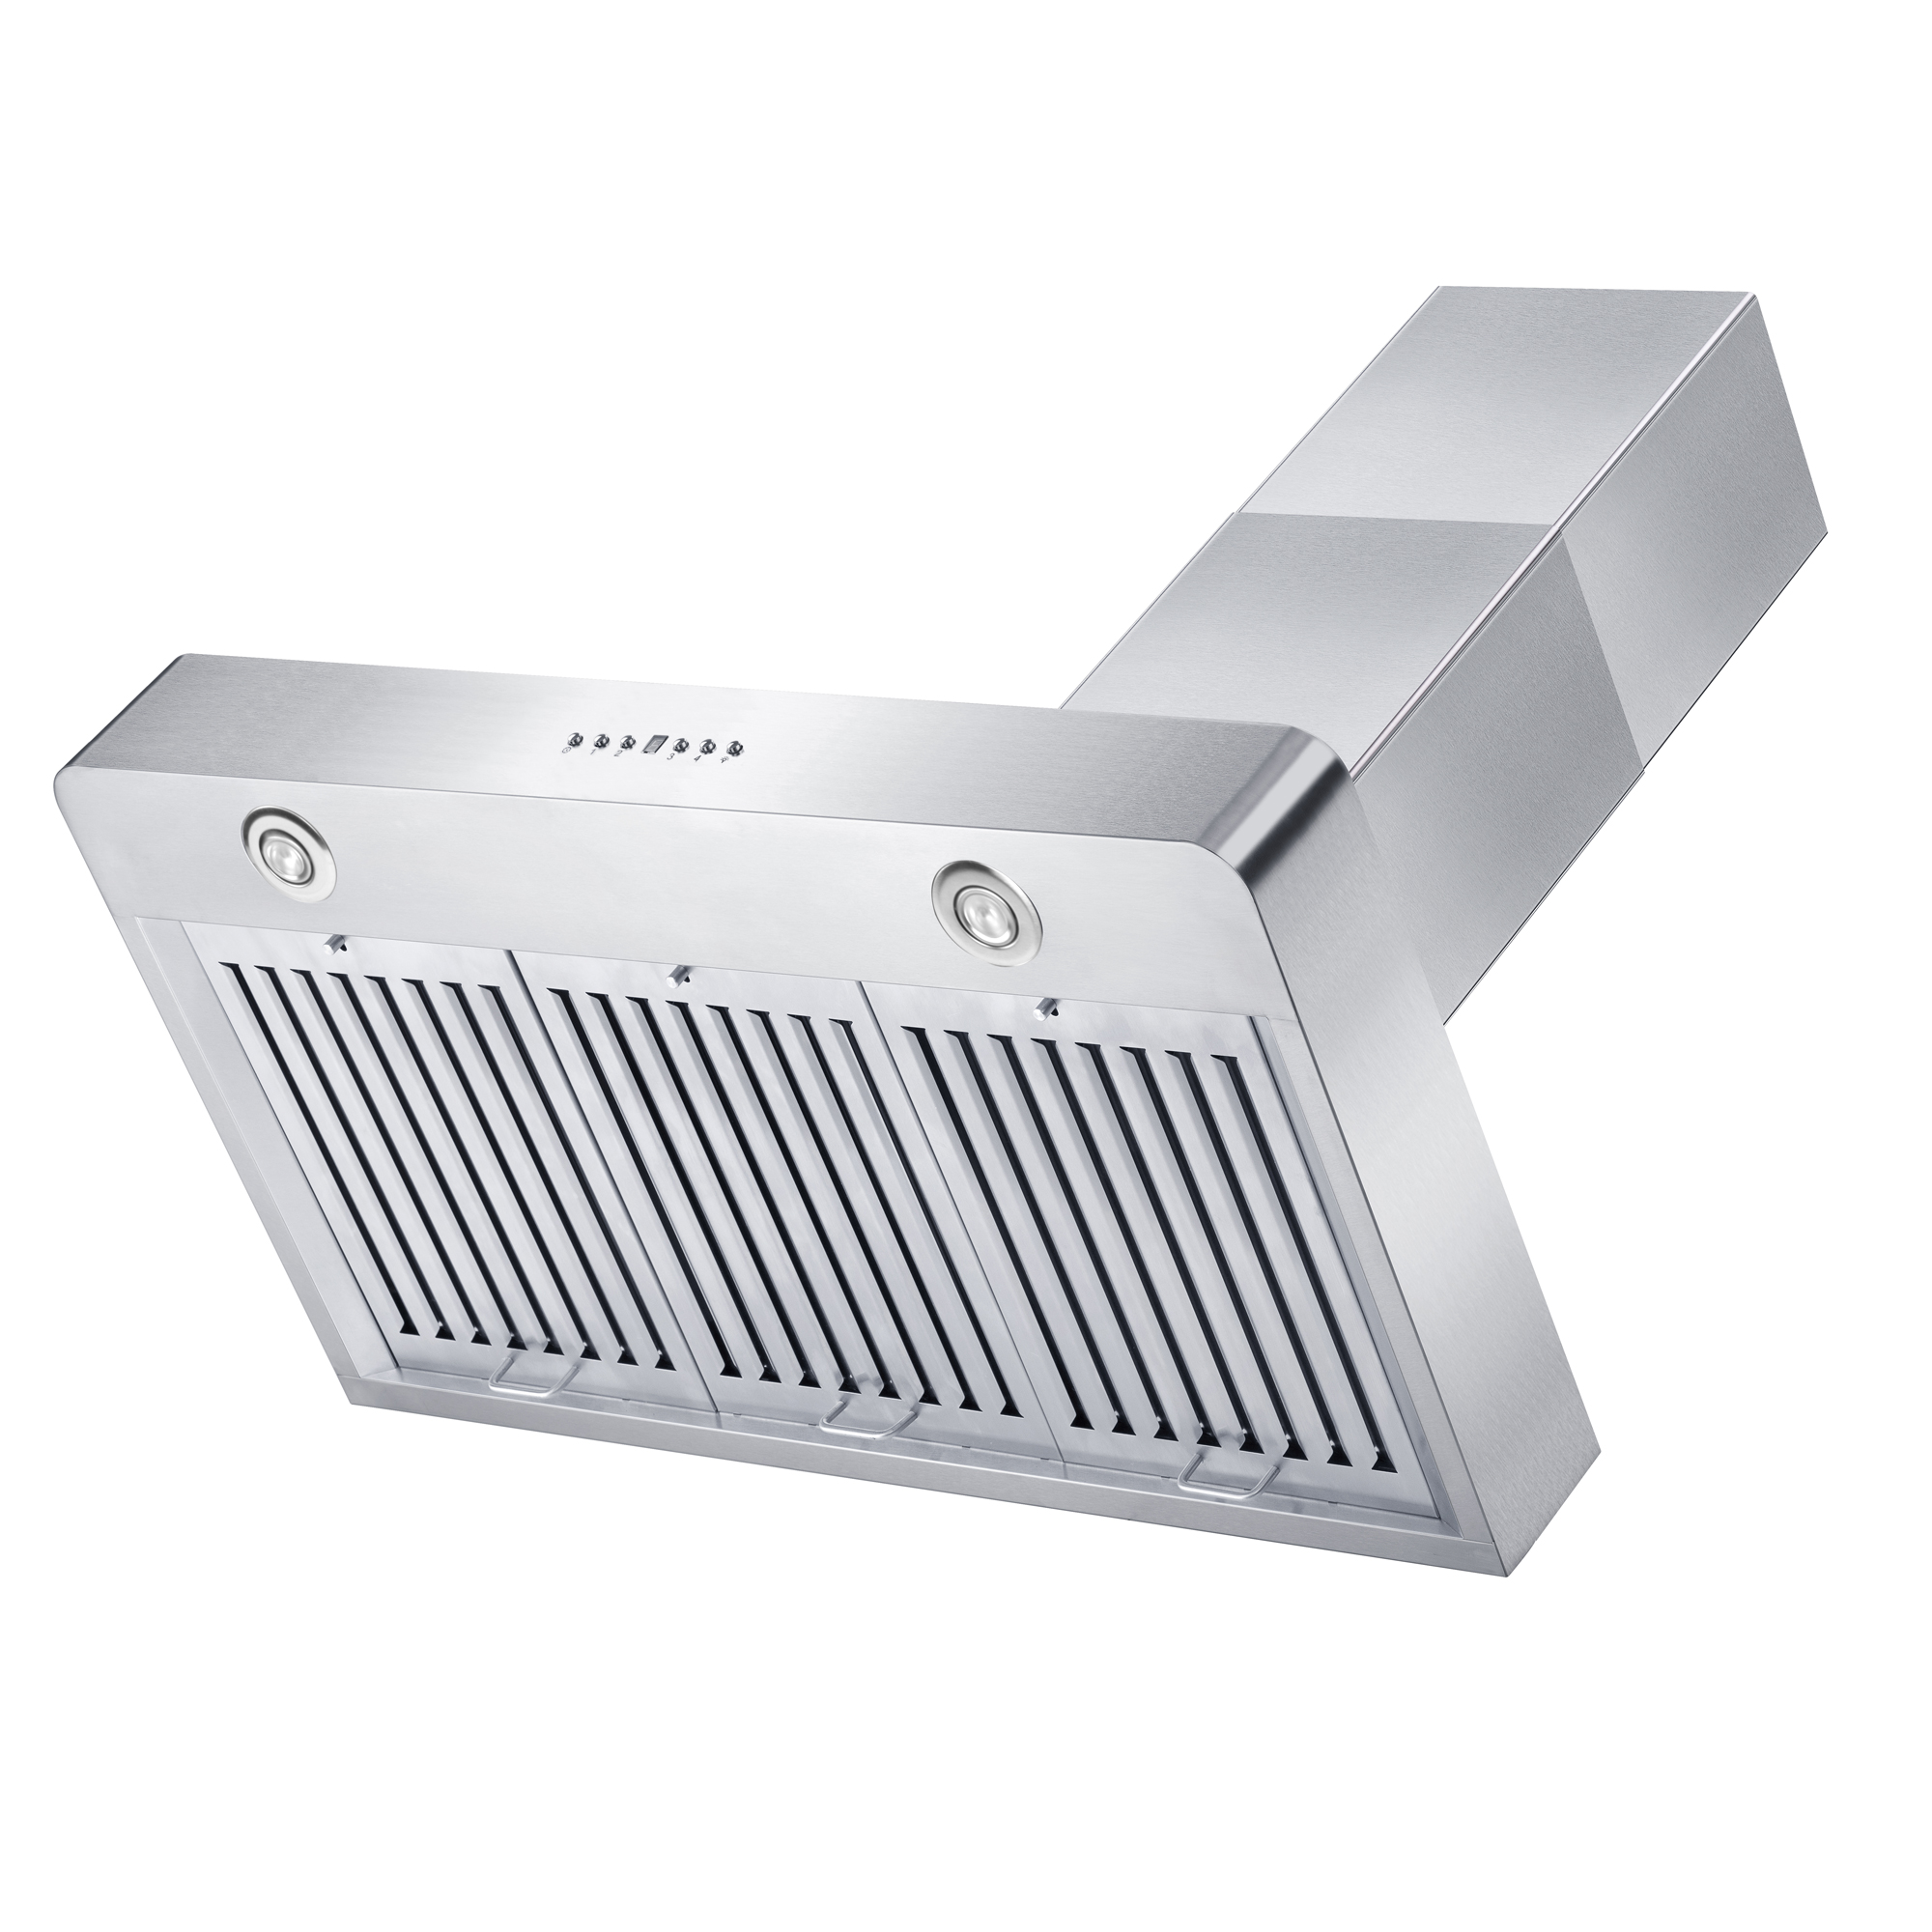 zline-stainless-steel-wall-mounted-range-hood-kf2-new-side-bottom.jpg